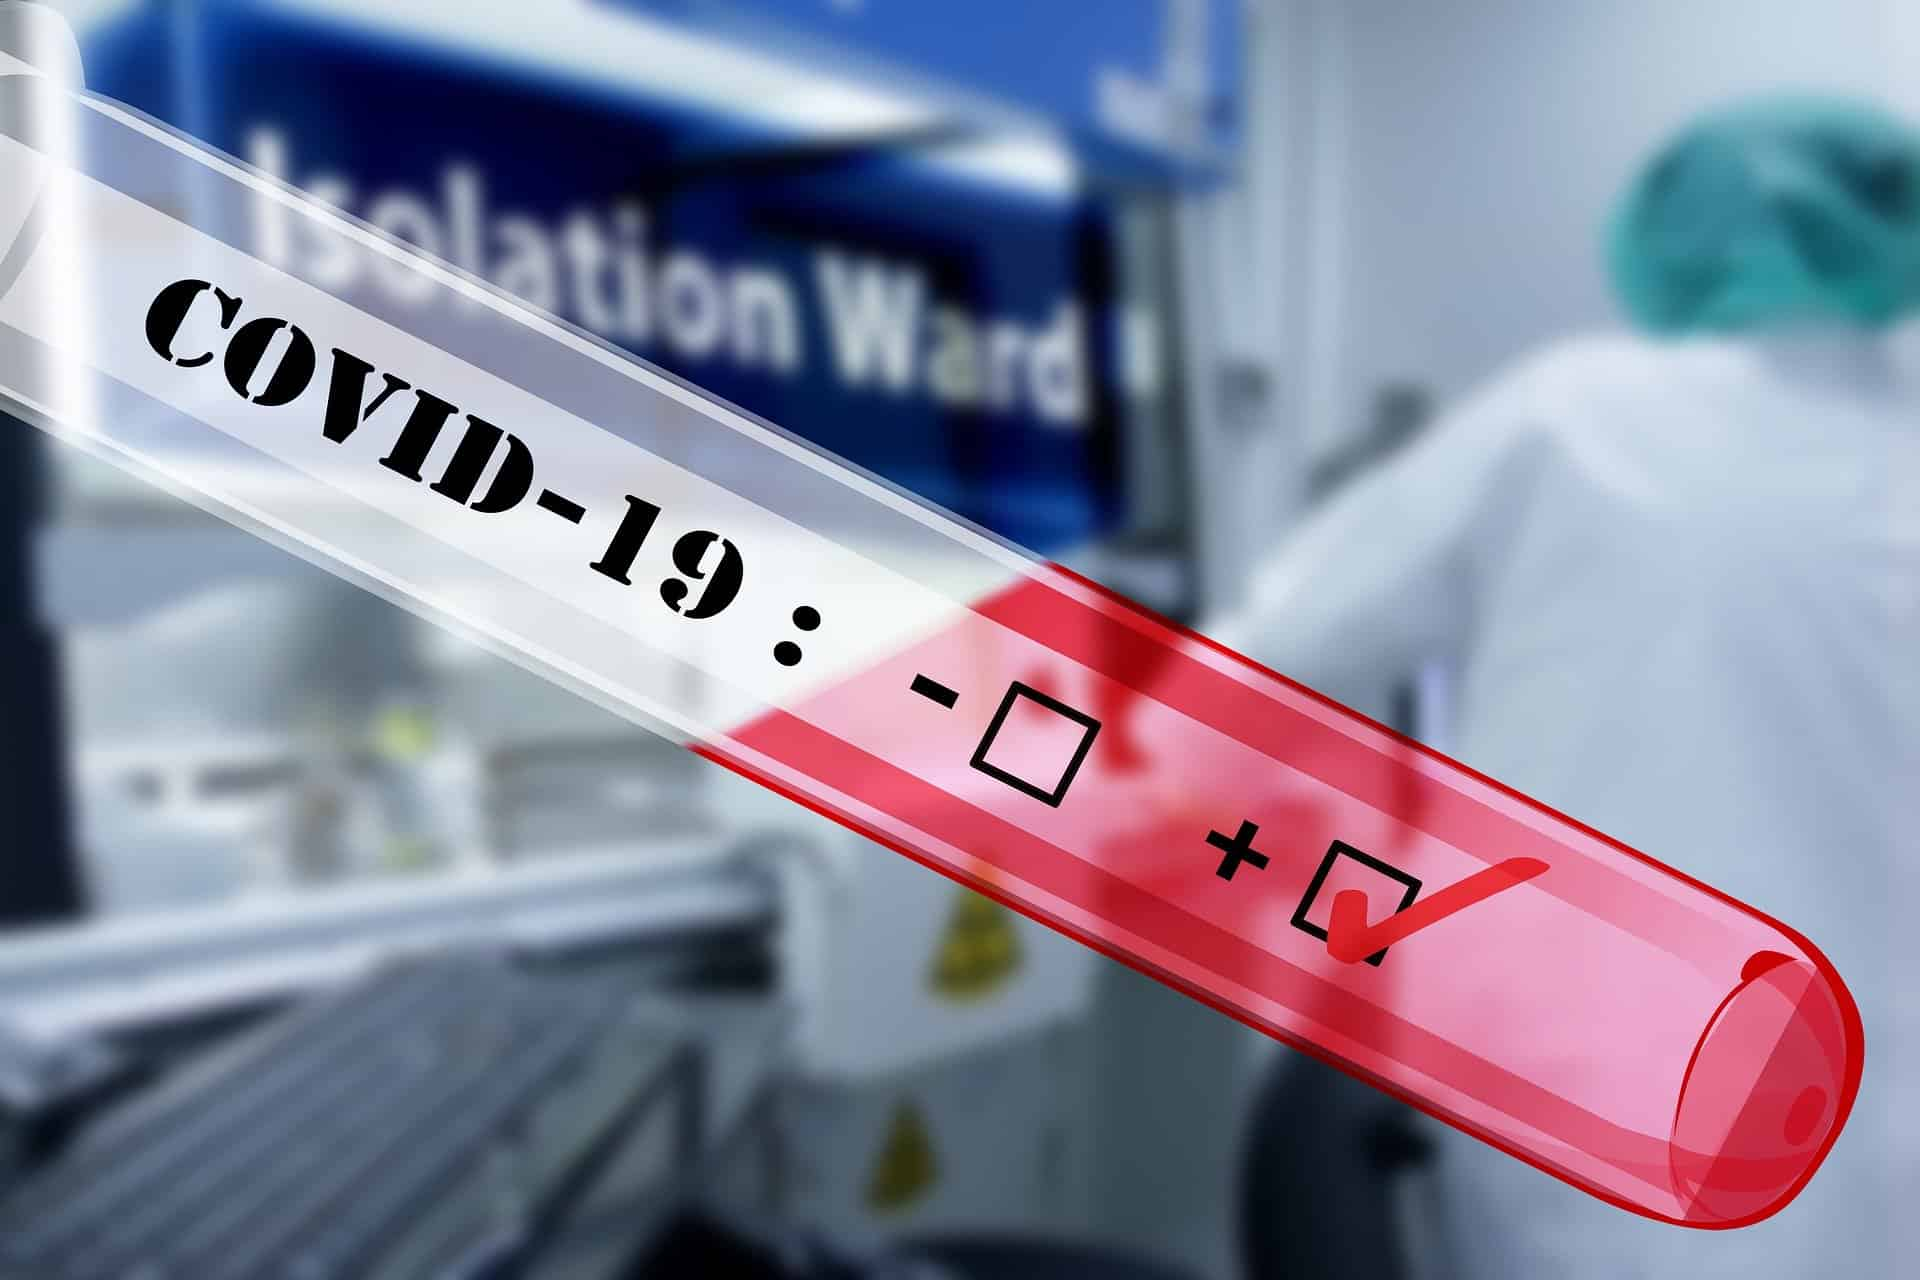 covid-19 virus testing